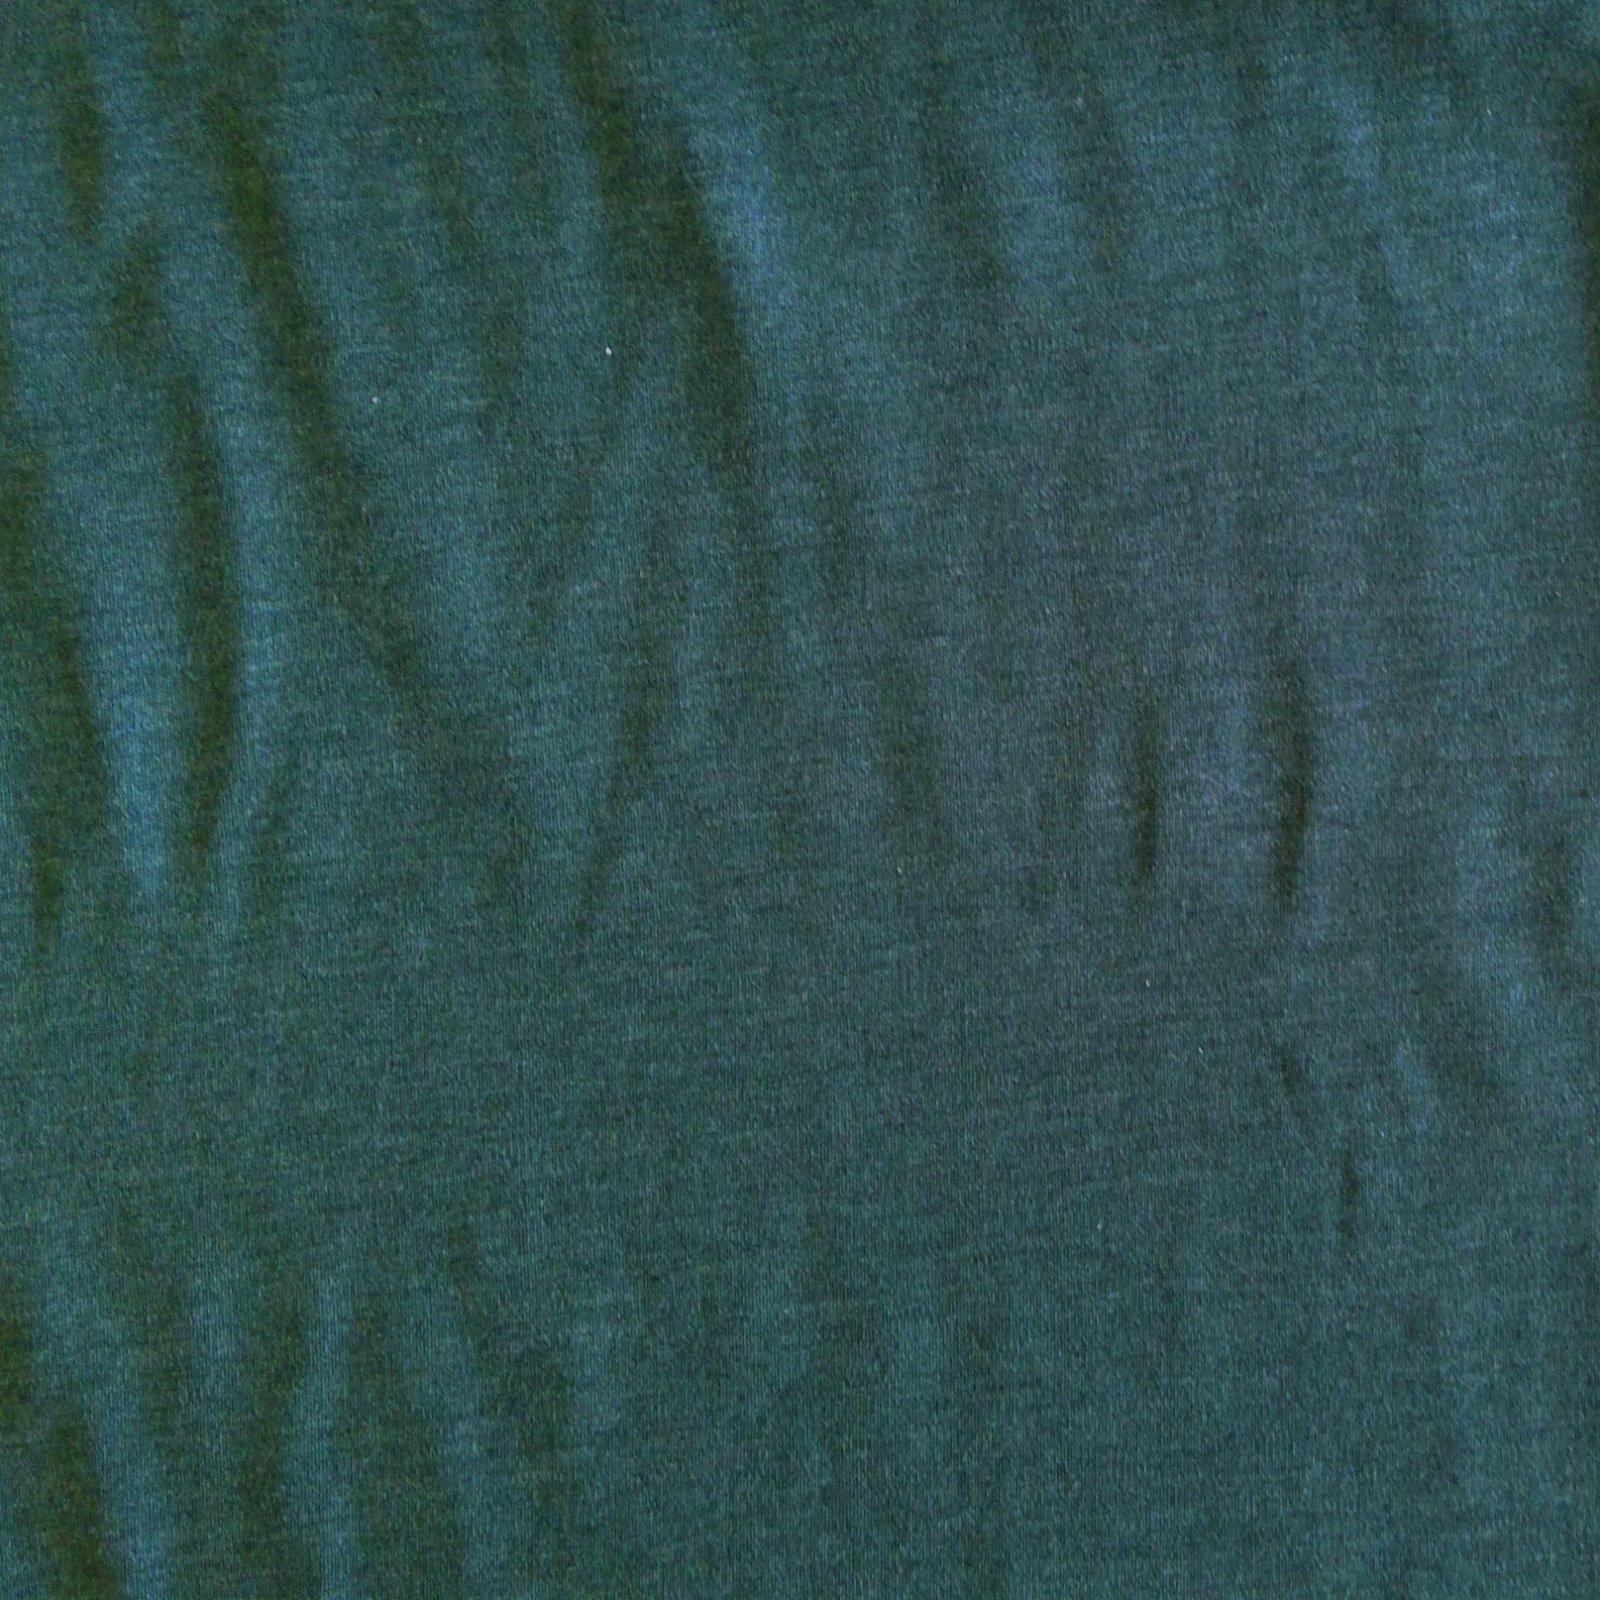 T-Shirt Interlock Cotton Blend, Bare Knits, Avocado